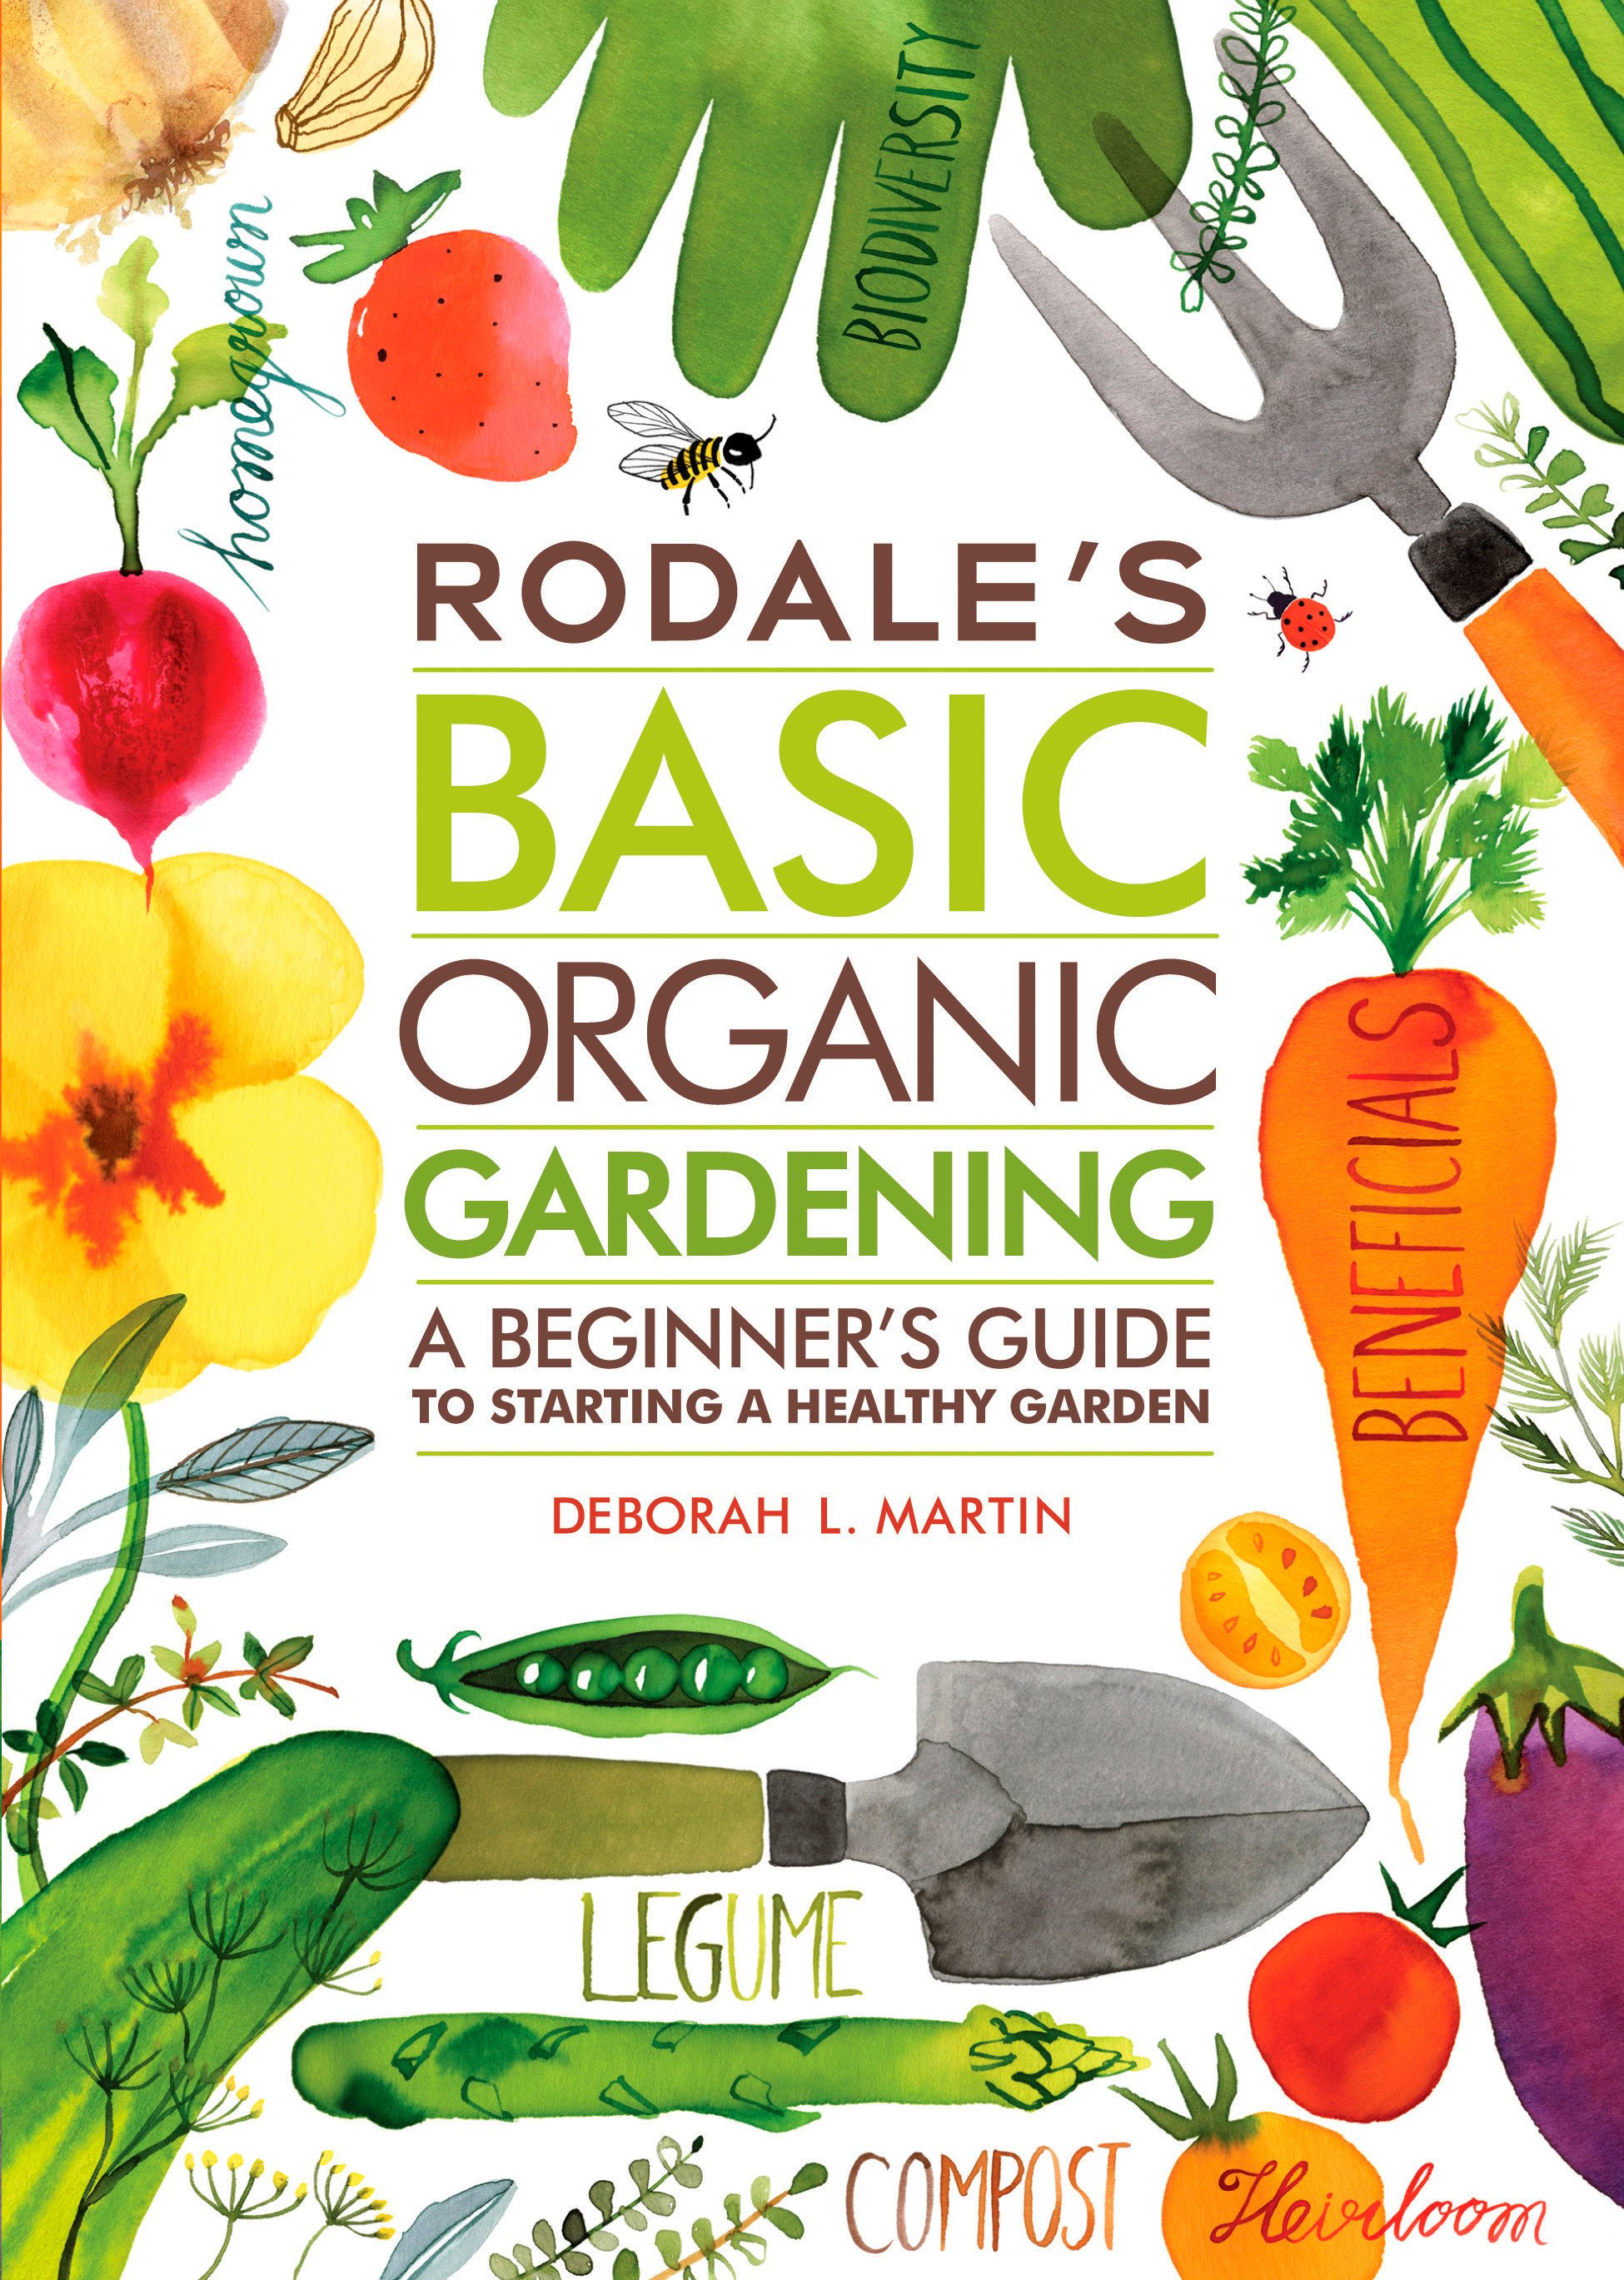 Cover Image of Rodale's Basic Organic Gardening